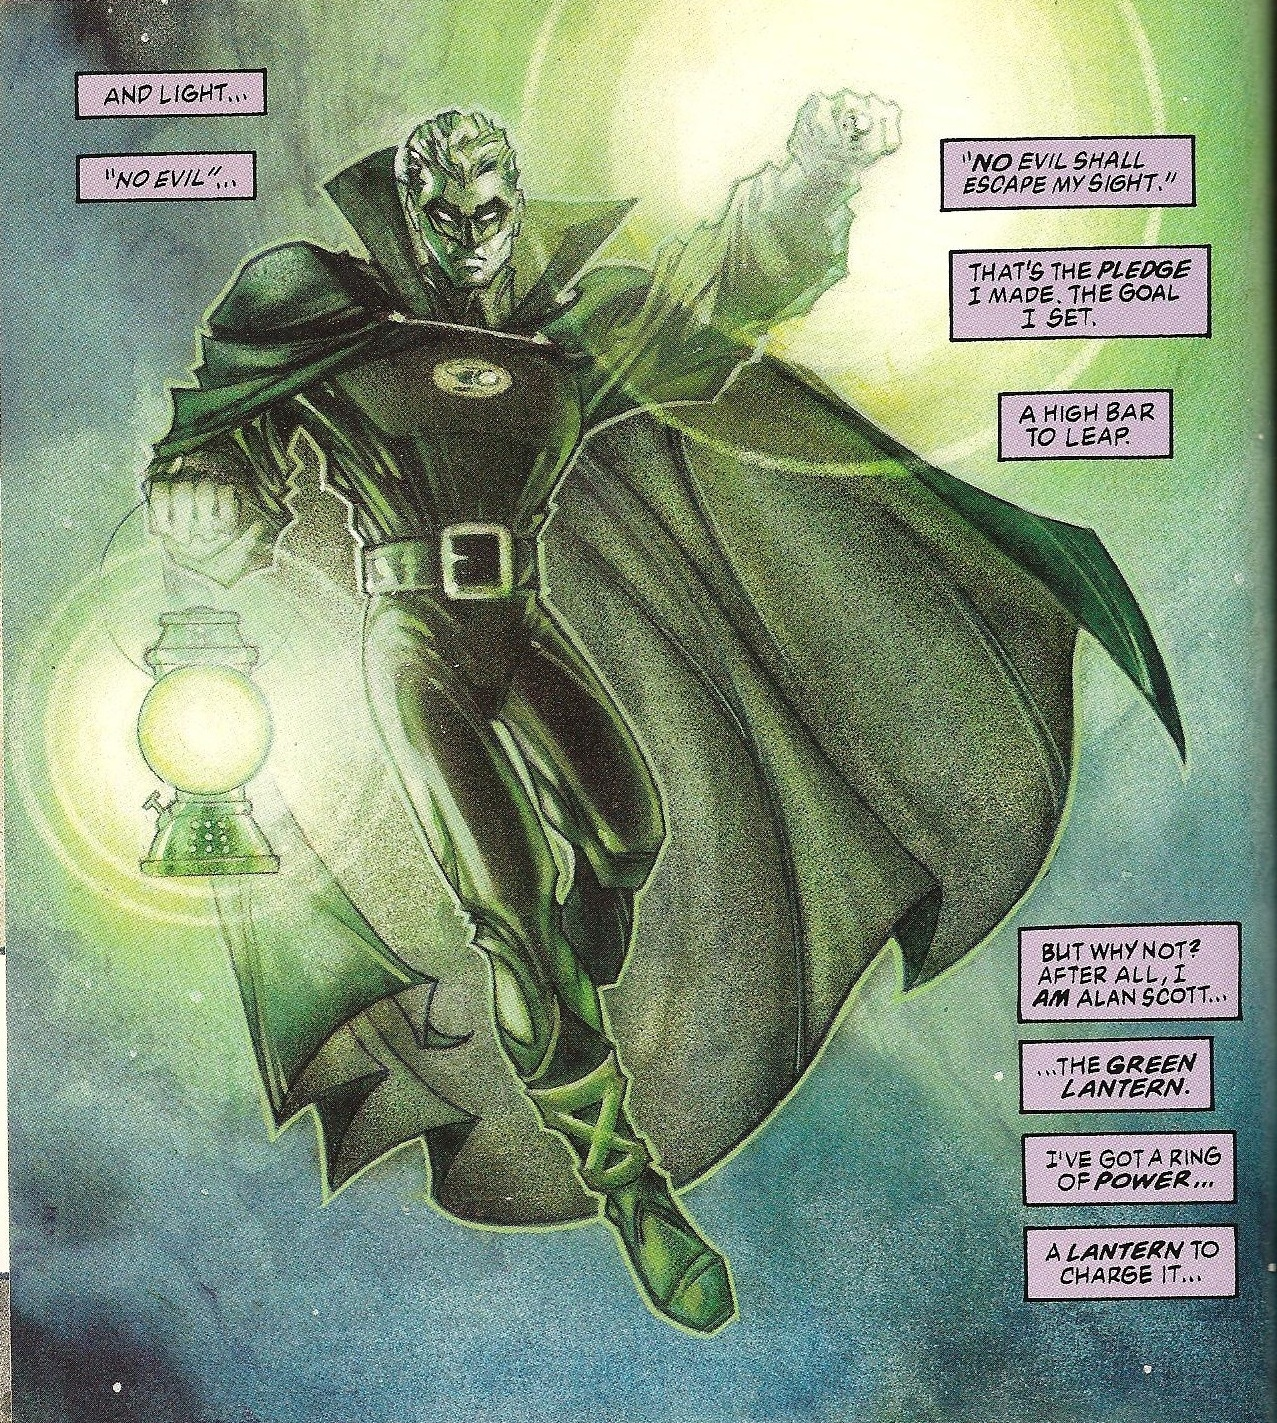 the green lantern alan scott